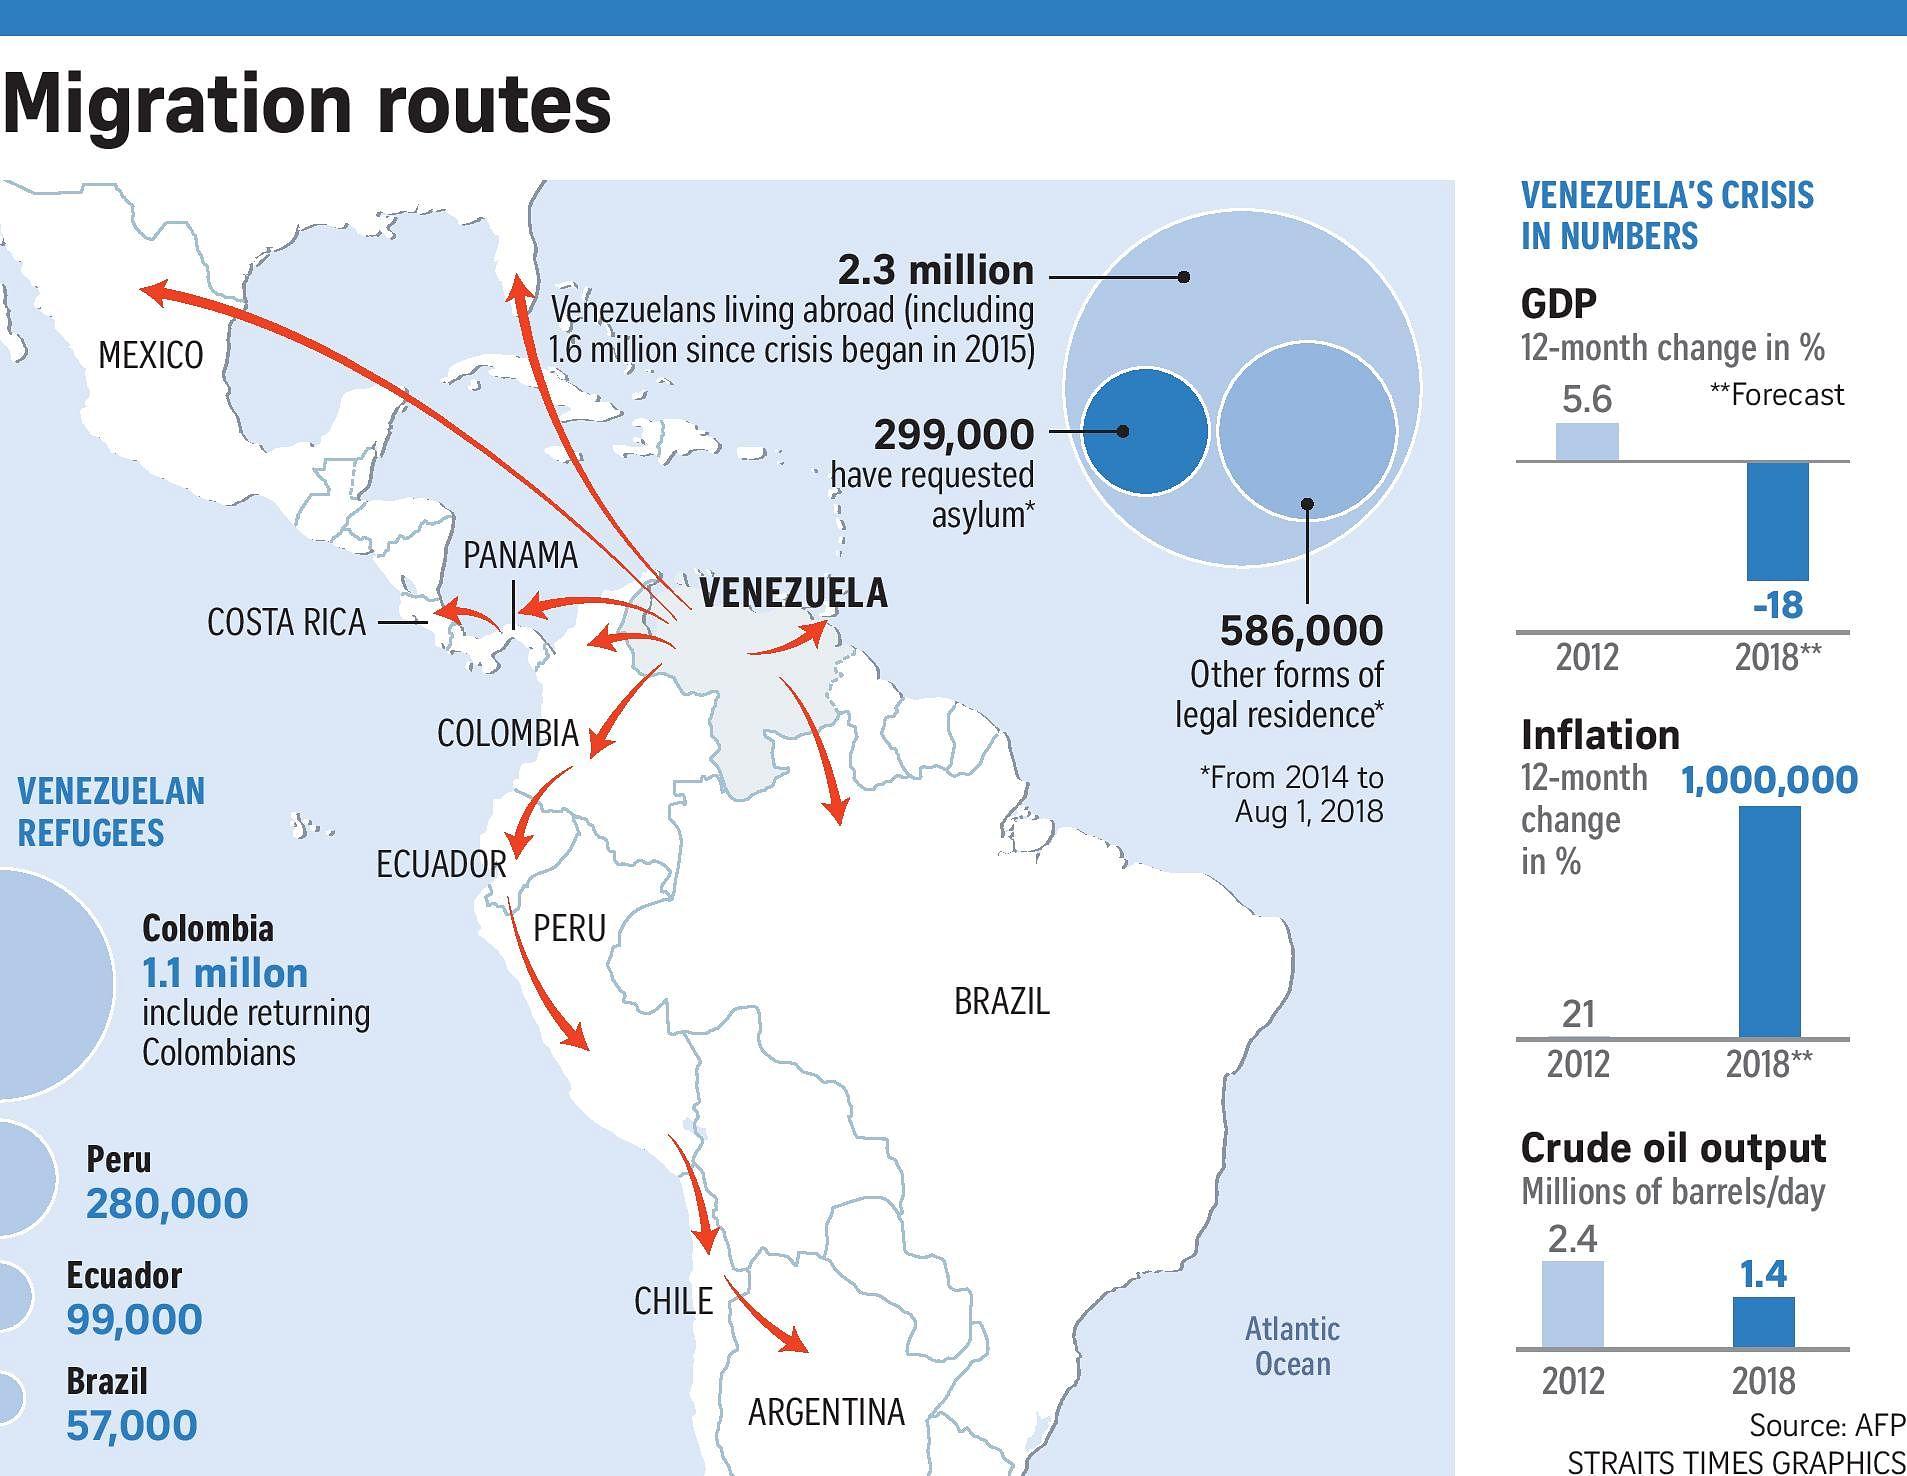 On foot, Venezuela's poor seek better lives across South